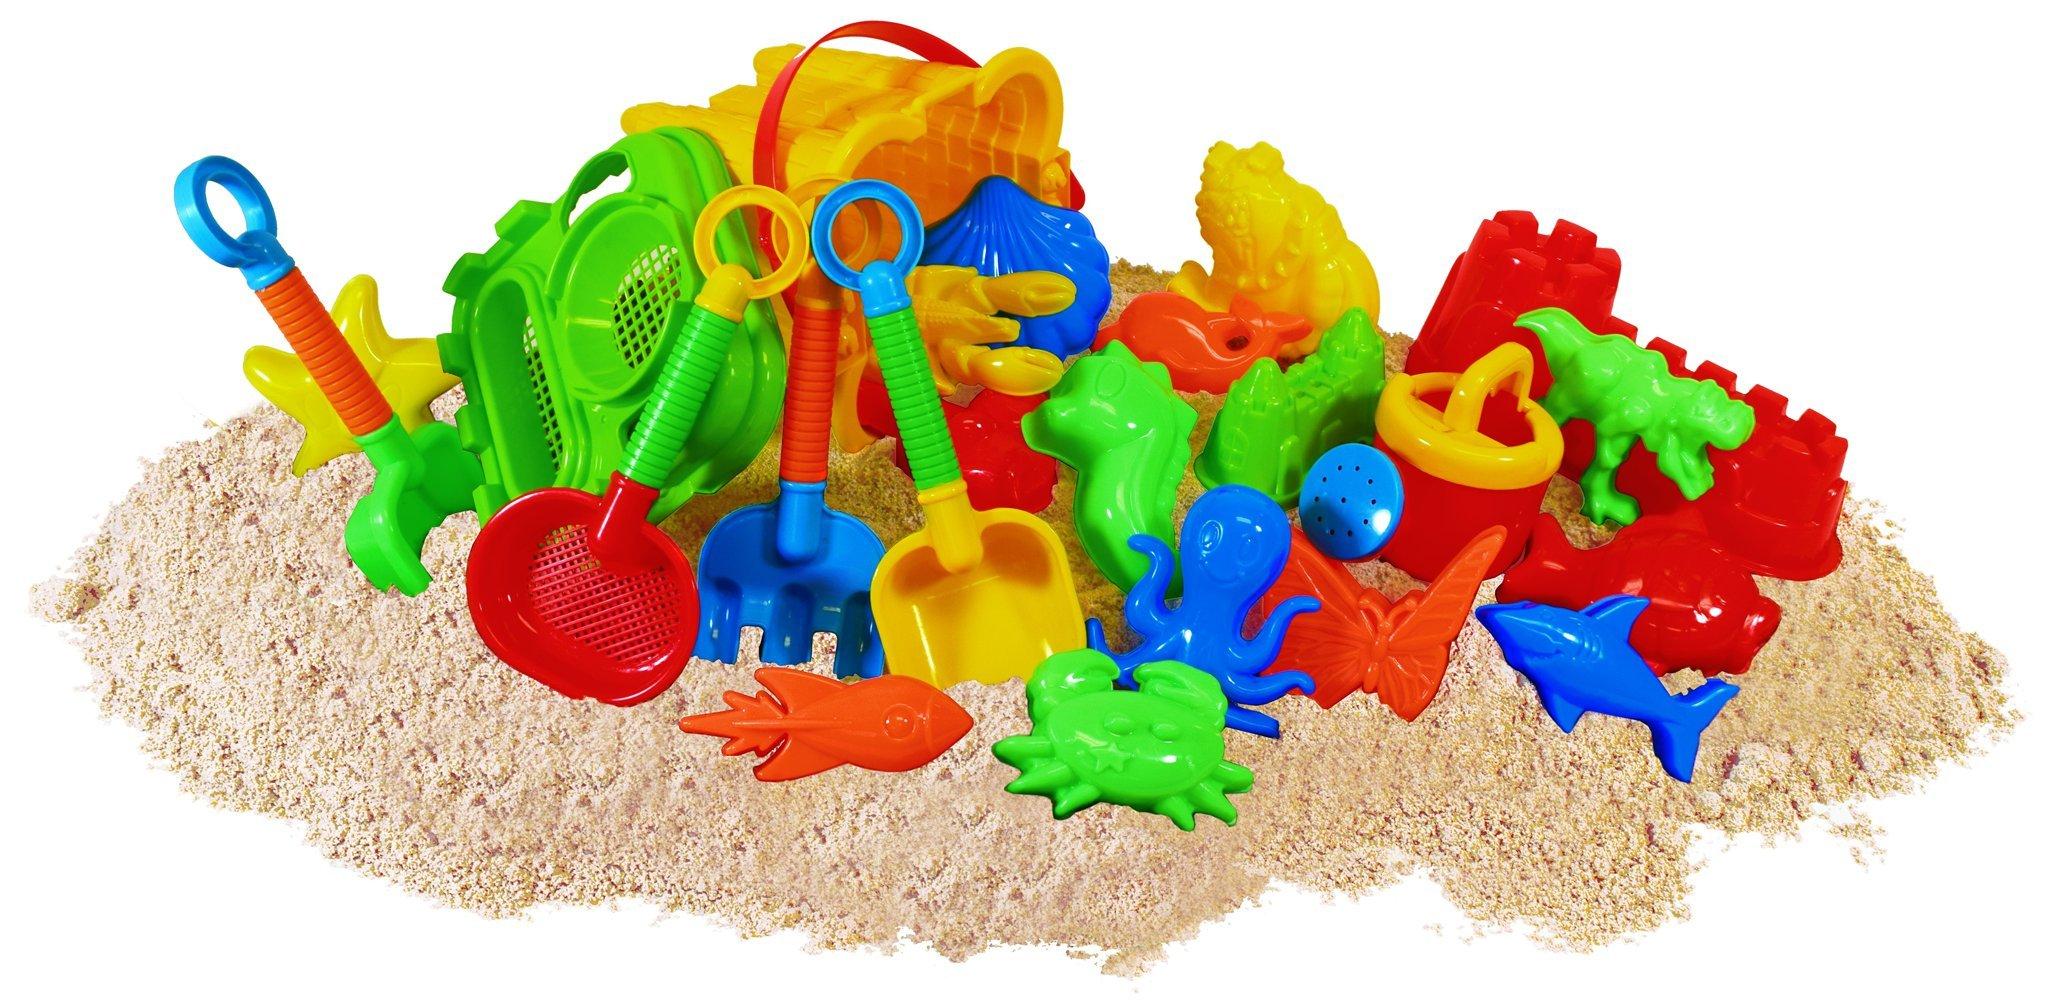 Beach Sand Toys For Kids : The best beach toys on market